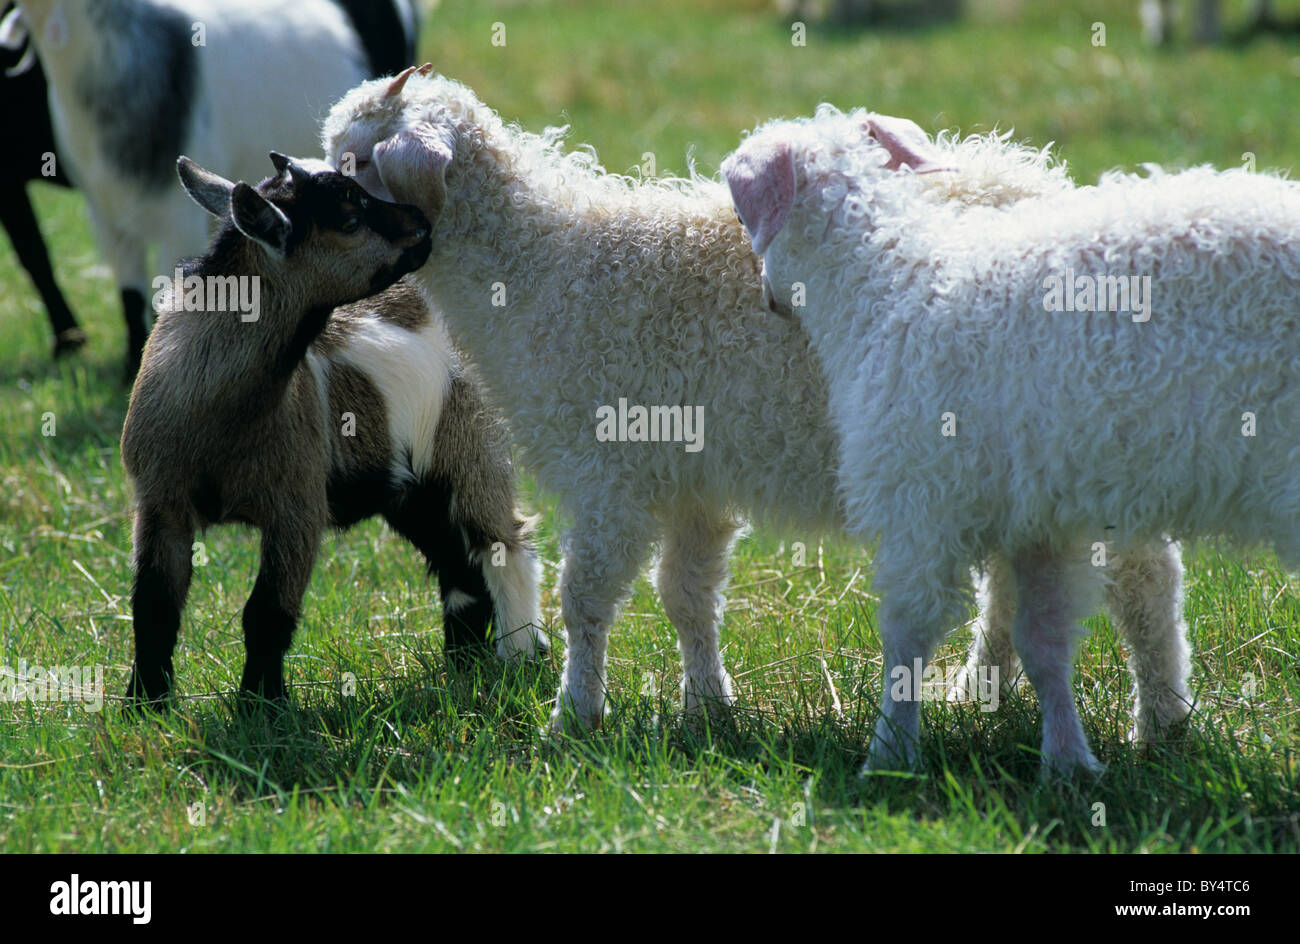 Pygmy goat kid with two Angora goat kids - Stock Image